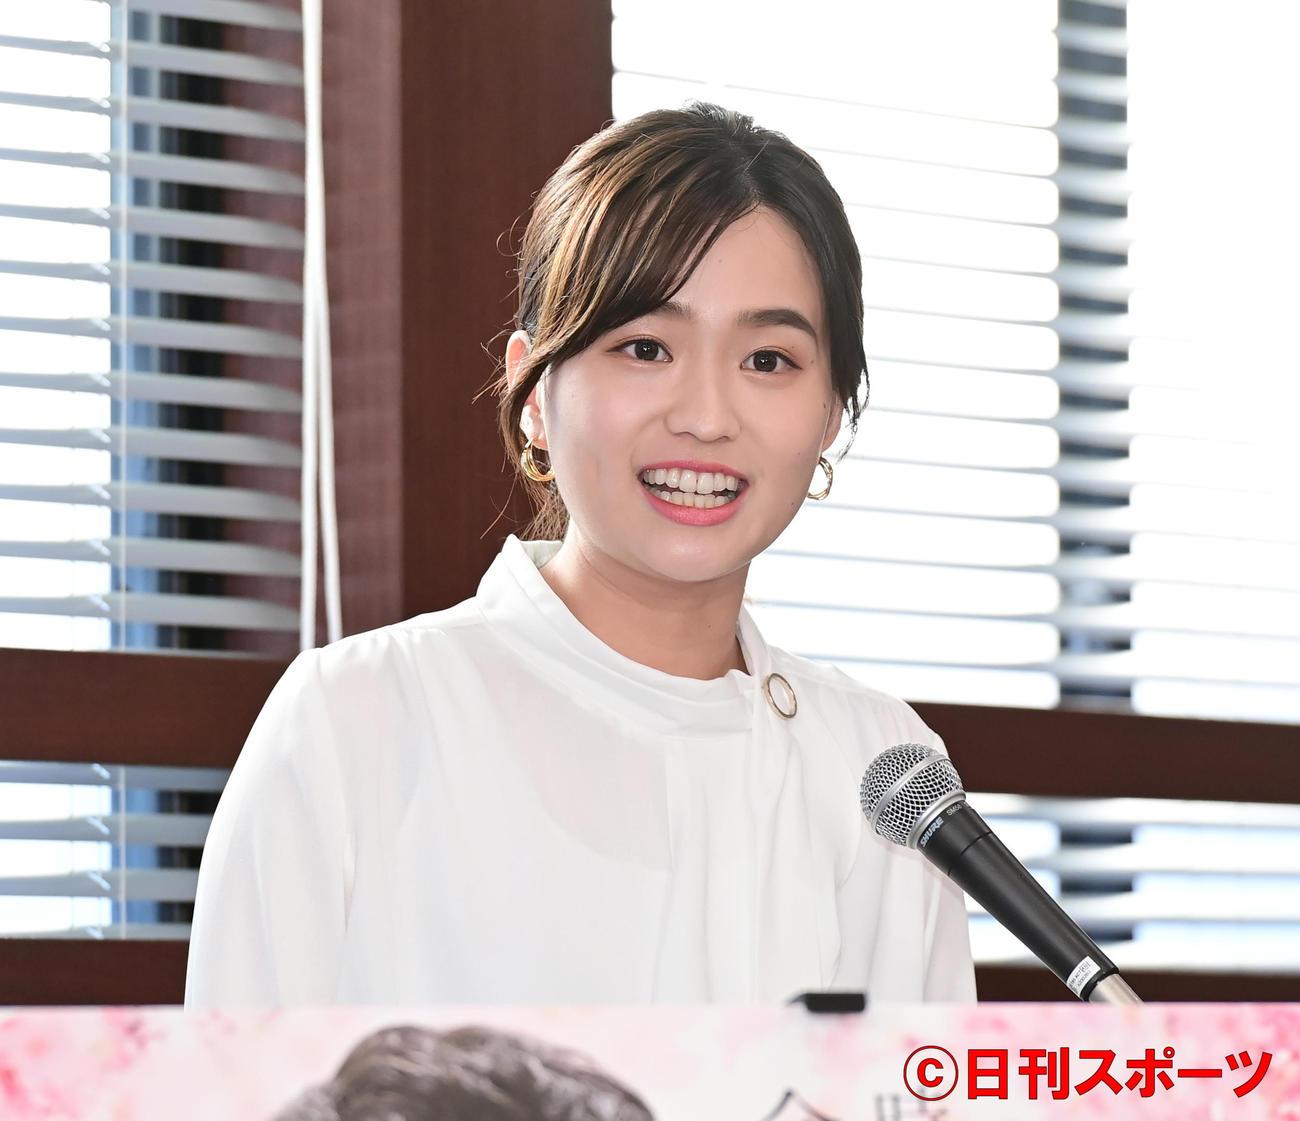 TBS系日曜劇場「ドラゴン桜」制作発表でMCを務めた篠原梨菜アナウンサー(撮影・小沢裕)